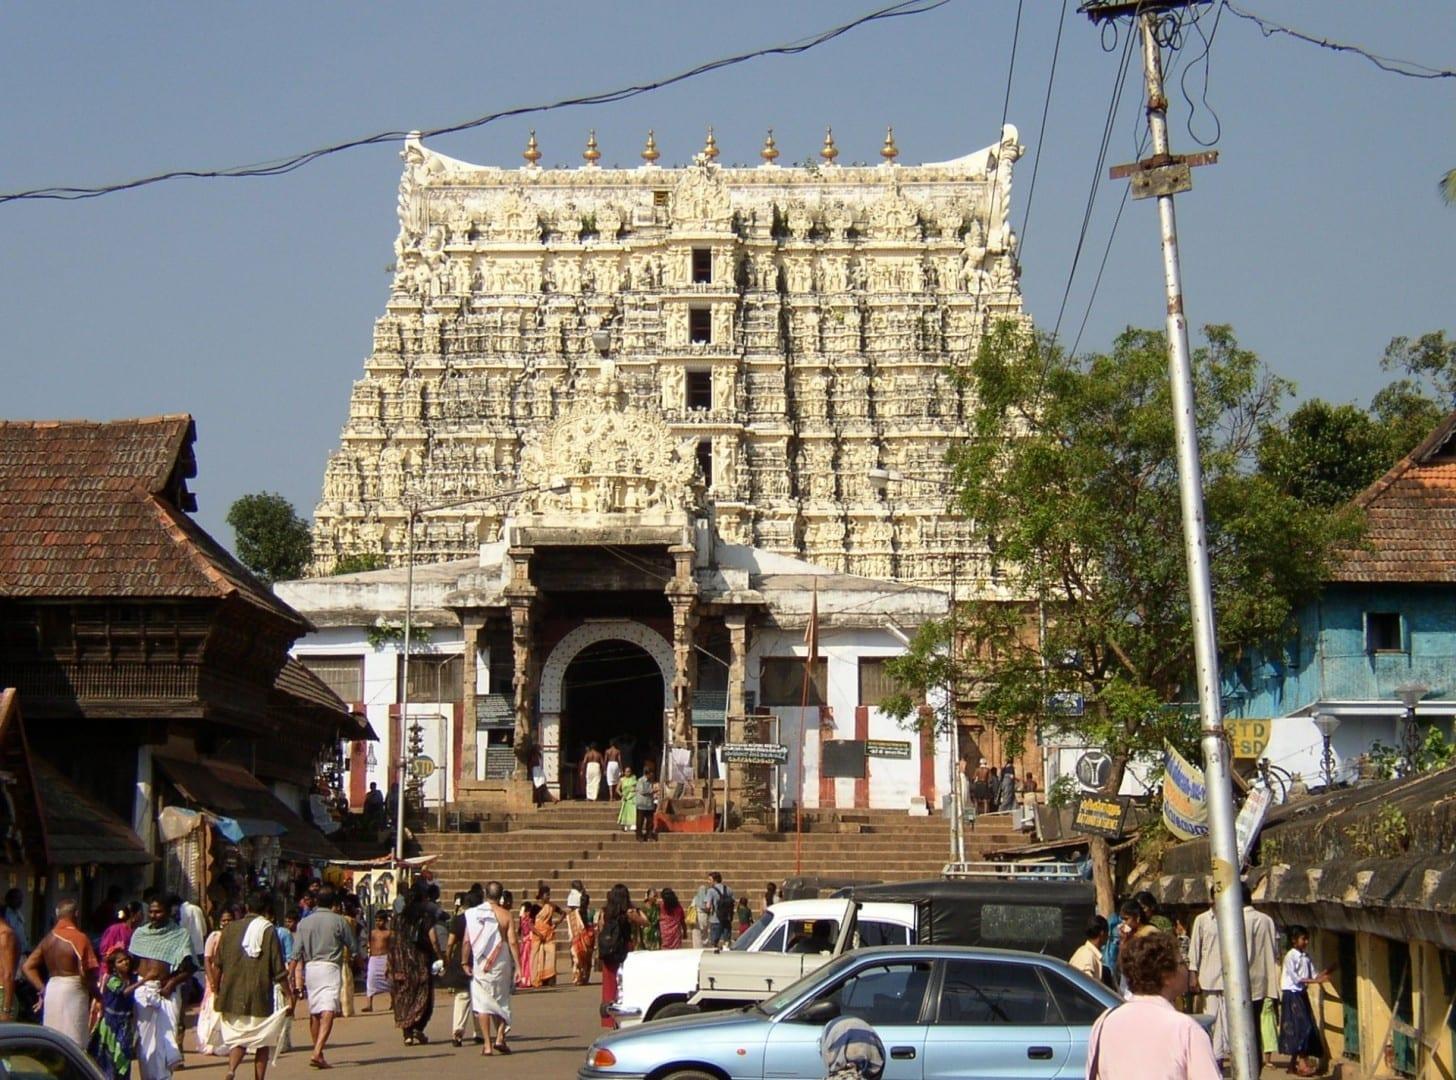 La gopuram, una torre monumental, a la entrada del templo de Sri Padmanabhaswamy. Thiruvananthapuram India